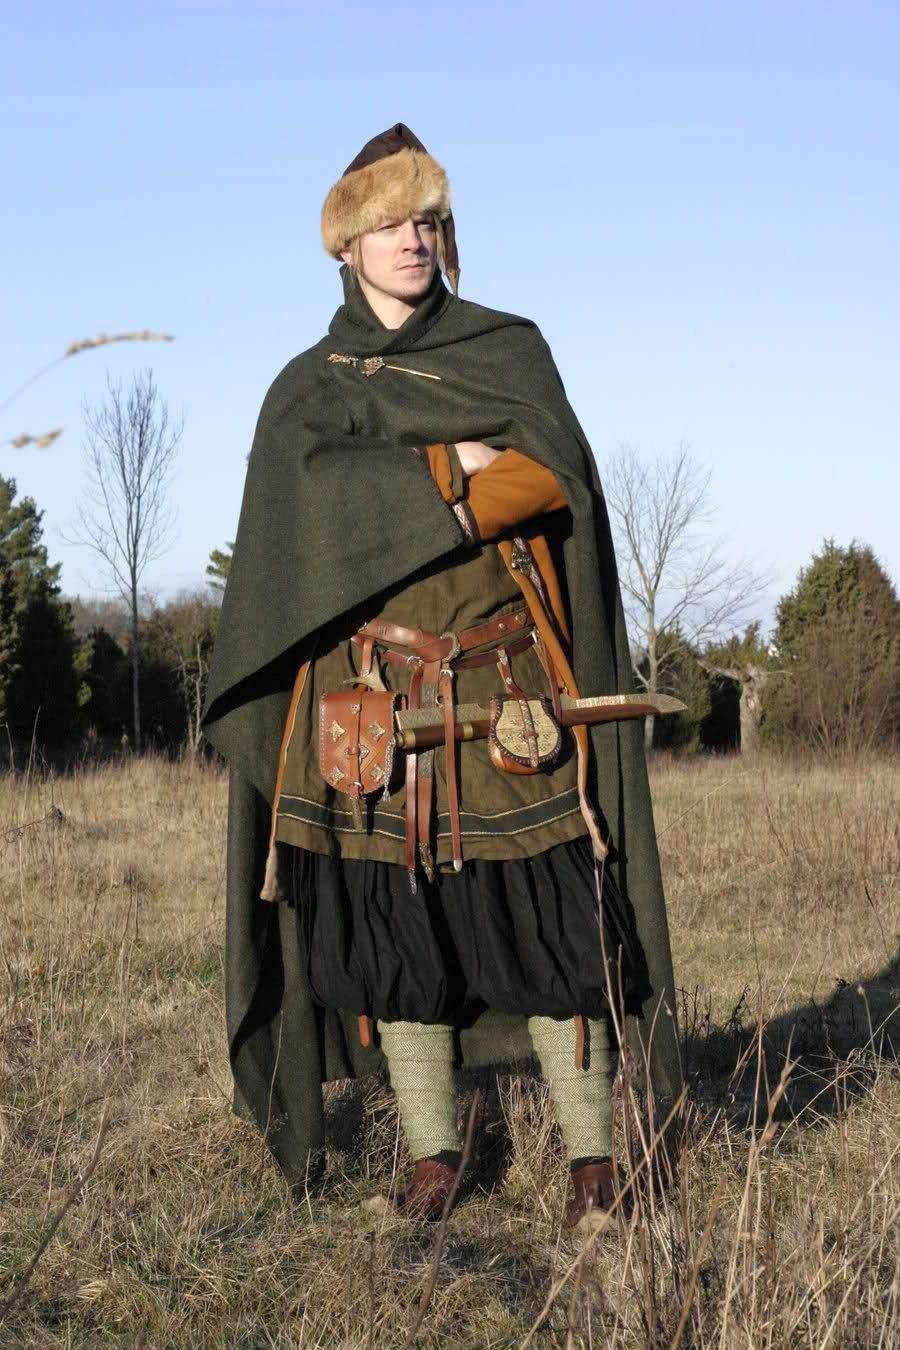 viking men clothing - Google Search | Viking | Swedish ... Ancient Vikings Clothing